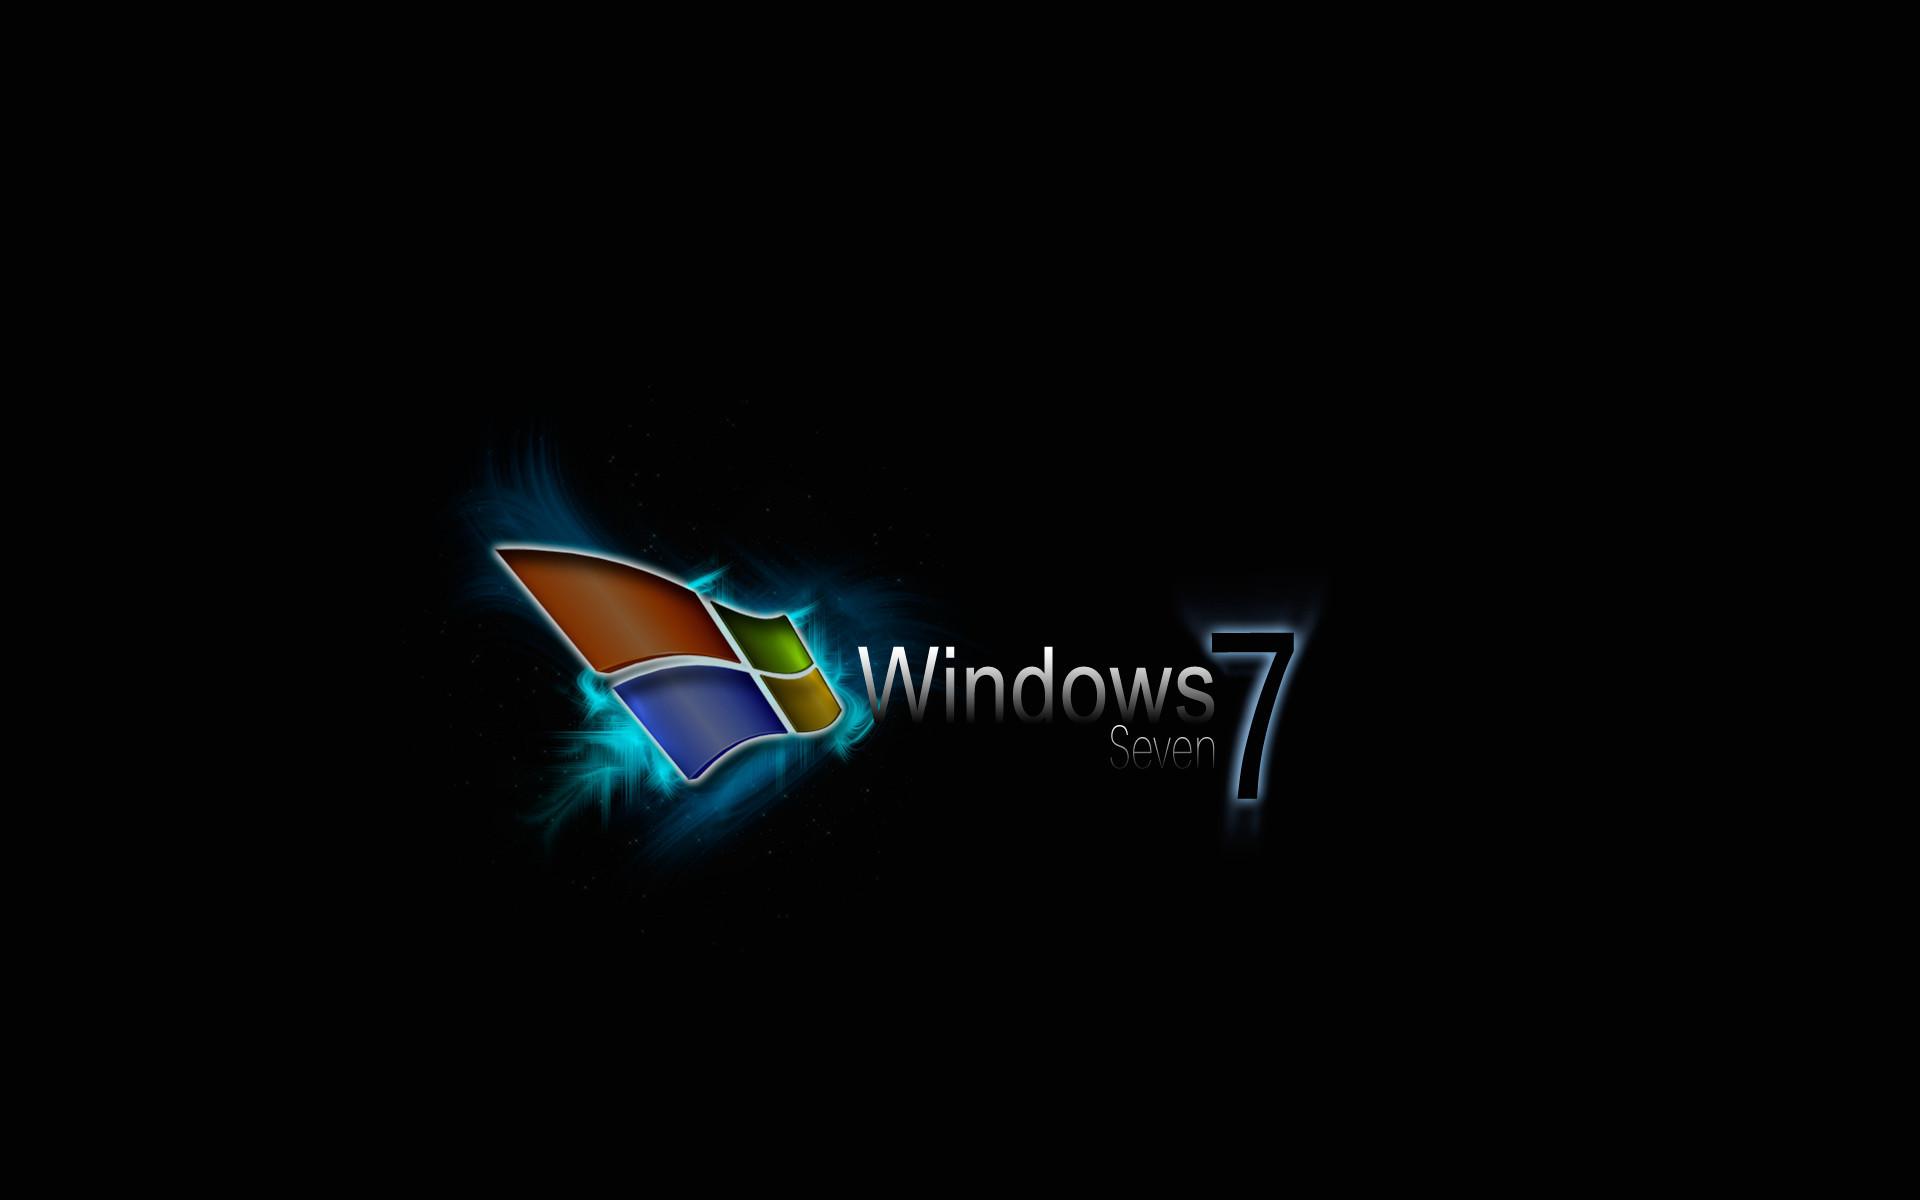 1920x1200 2560x1440 Windows 8 Gif Wallpaper Download Matrix Moving High Resolution Xjgs Hd